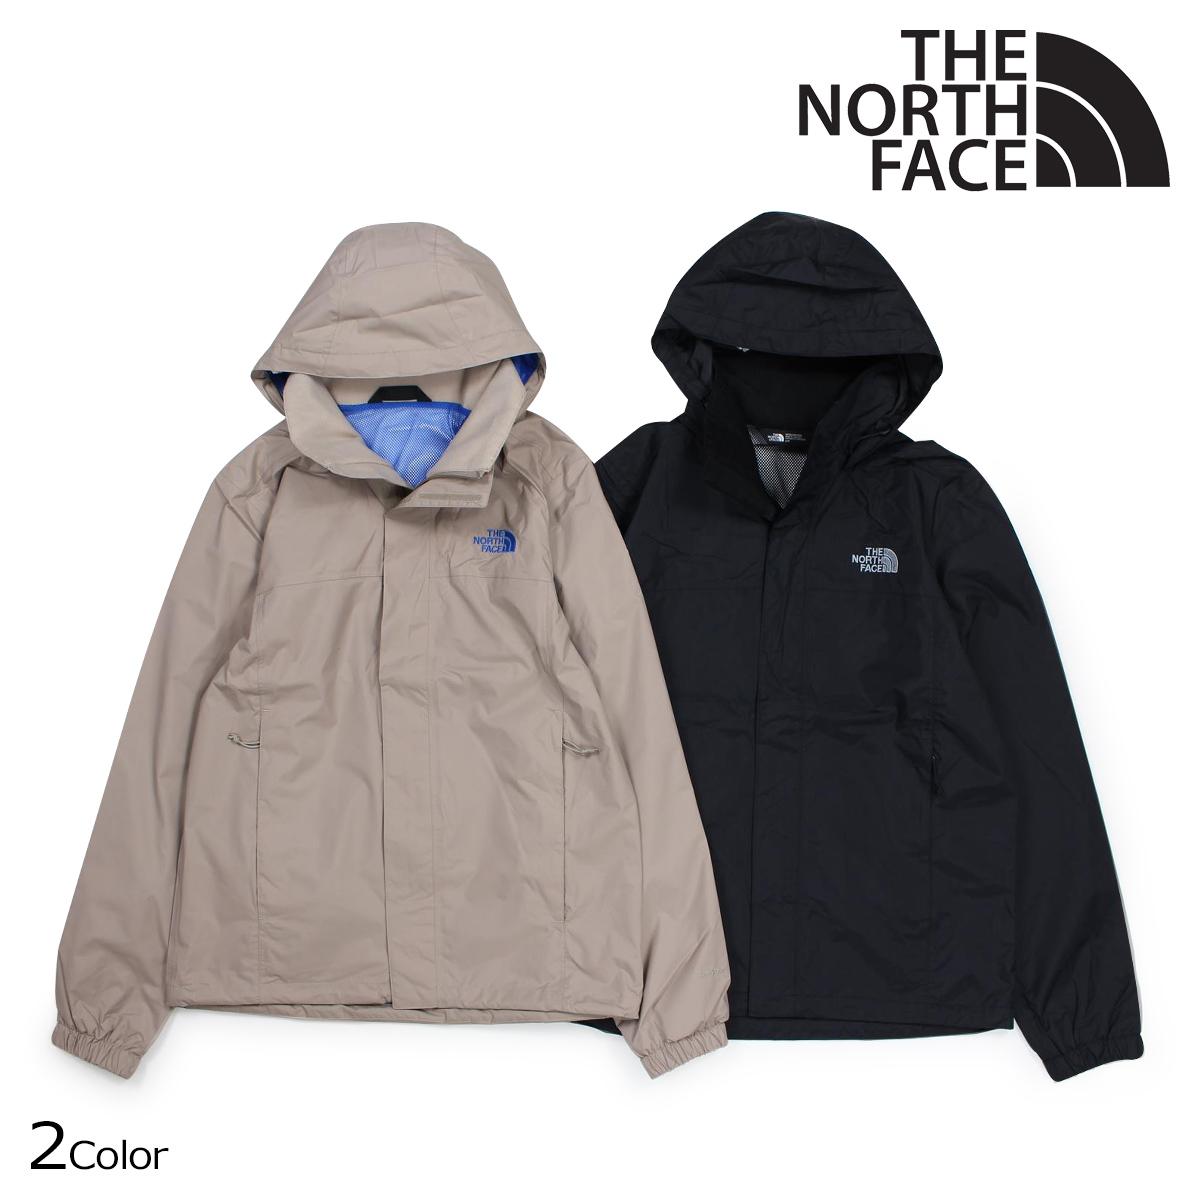 ALLSPORTS  THE NORTH FACE MENS RESOLVE 2 JACKET North Face jacket mountain  parka men black beige NF0A2VD5  3 7 Shinnyu load   183   5619863c9